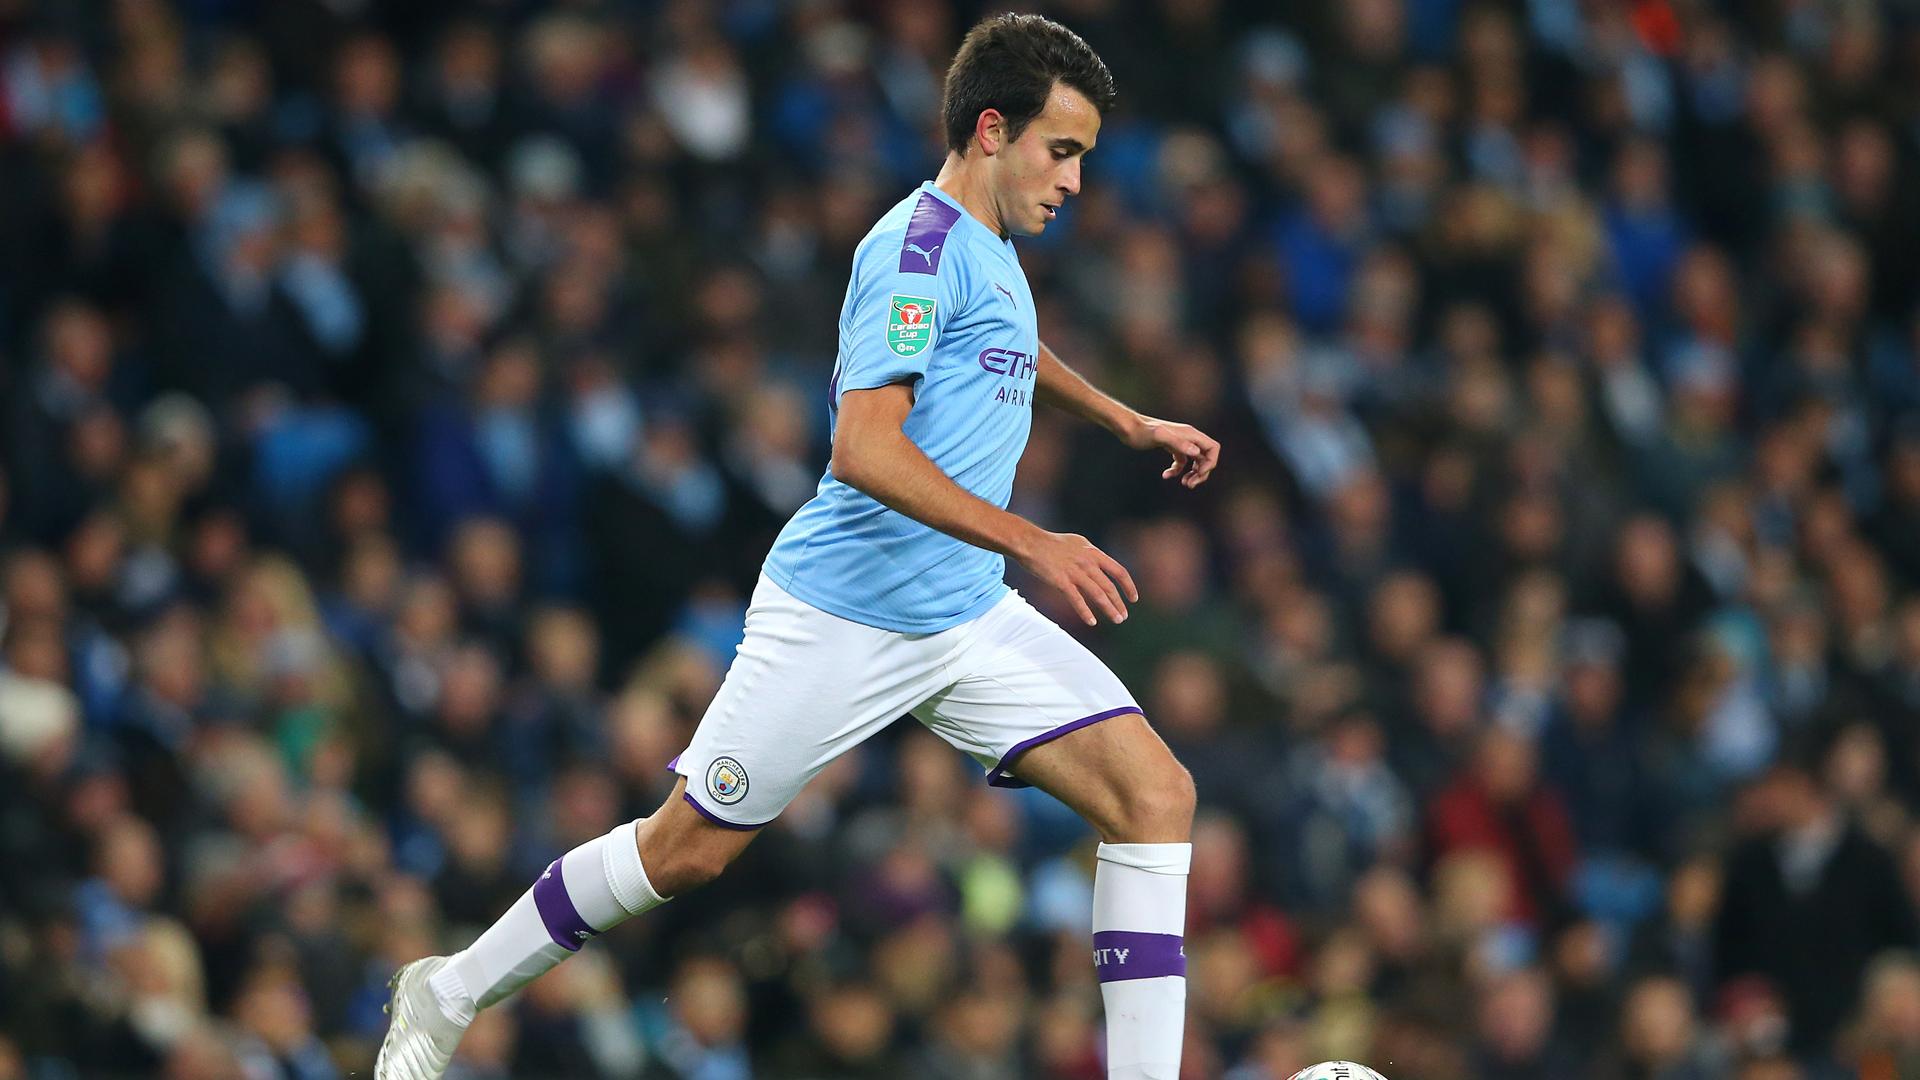 Guardiola 'confident' Garcia will stay at Man City amid Barcelona links